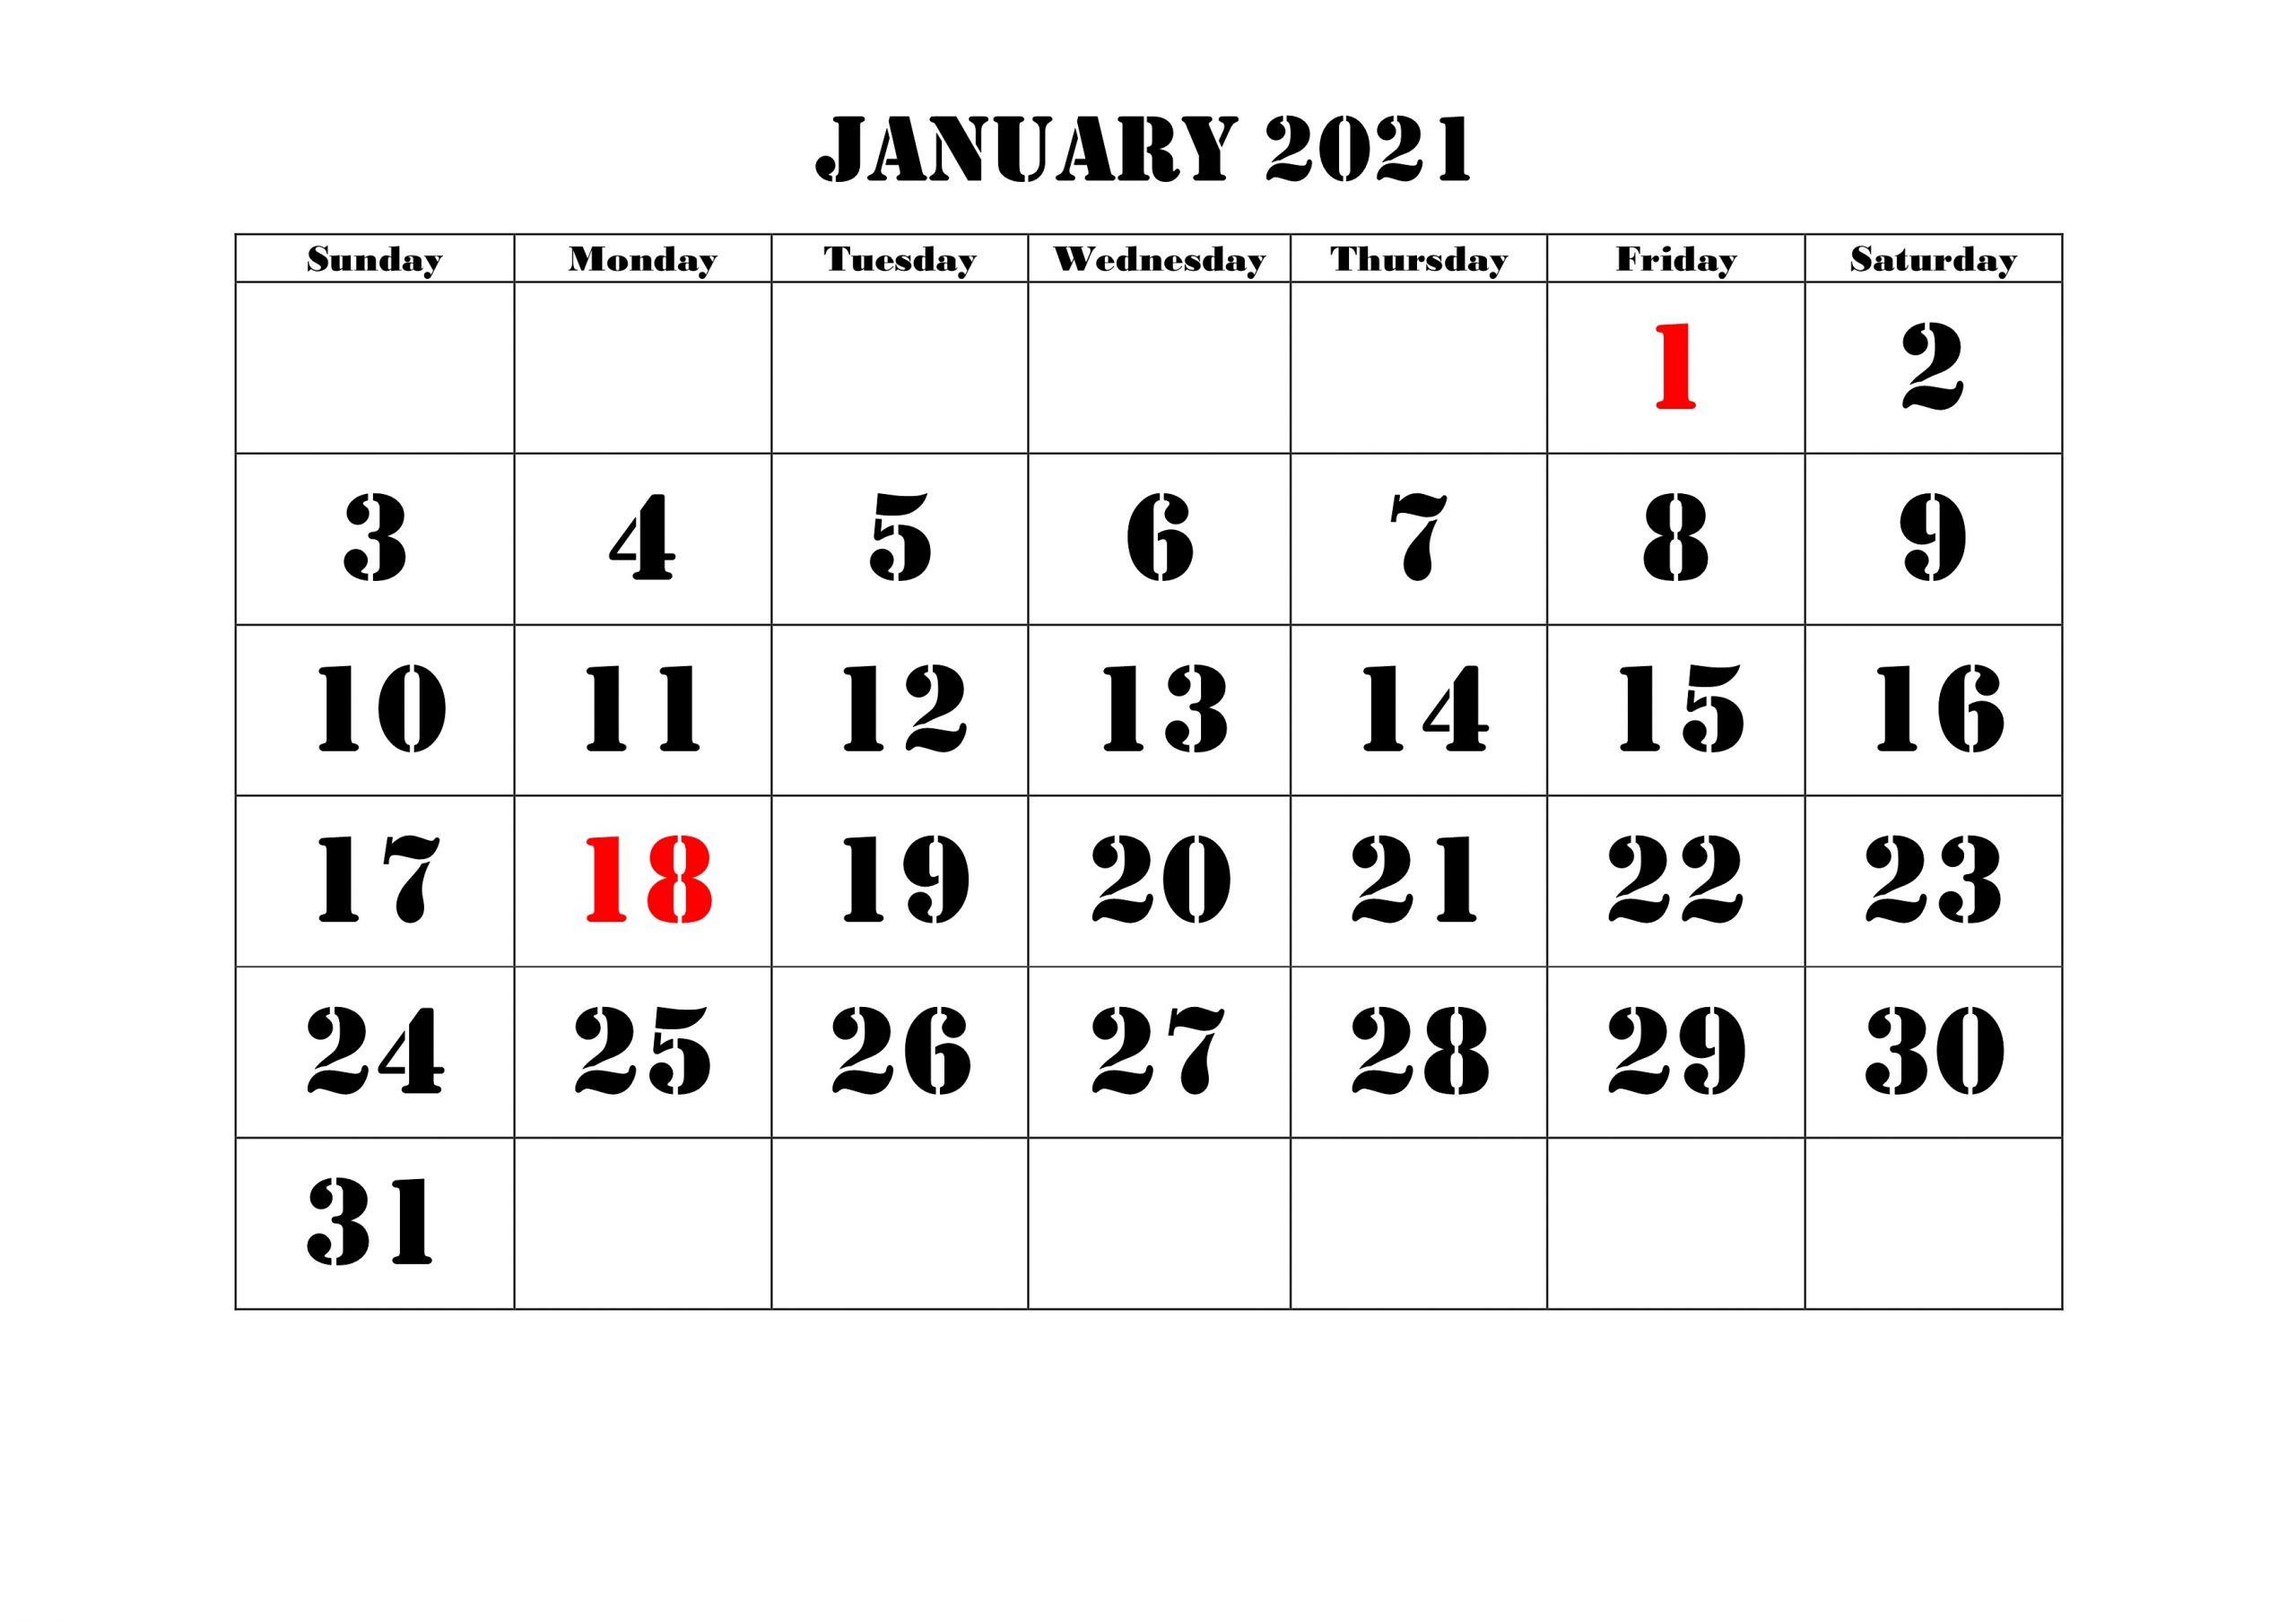 January 2021 Calendar Urdu